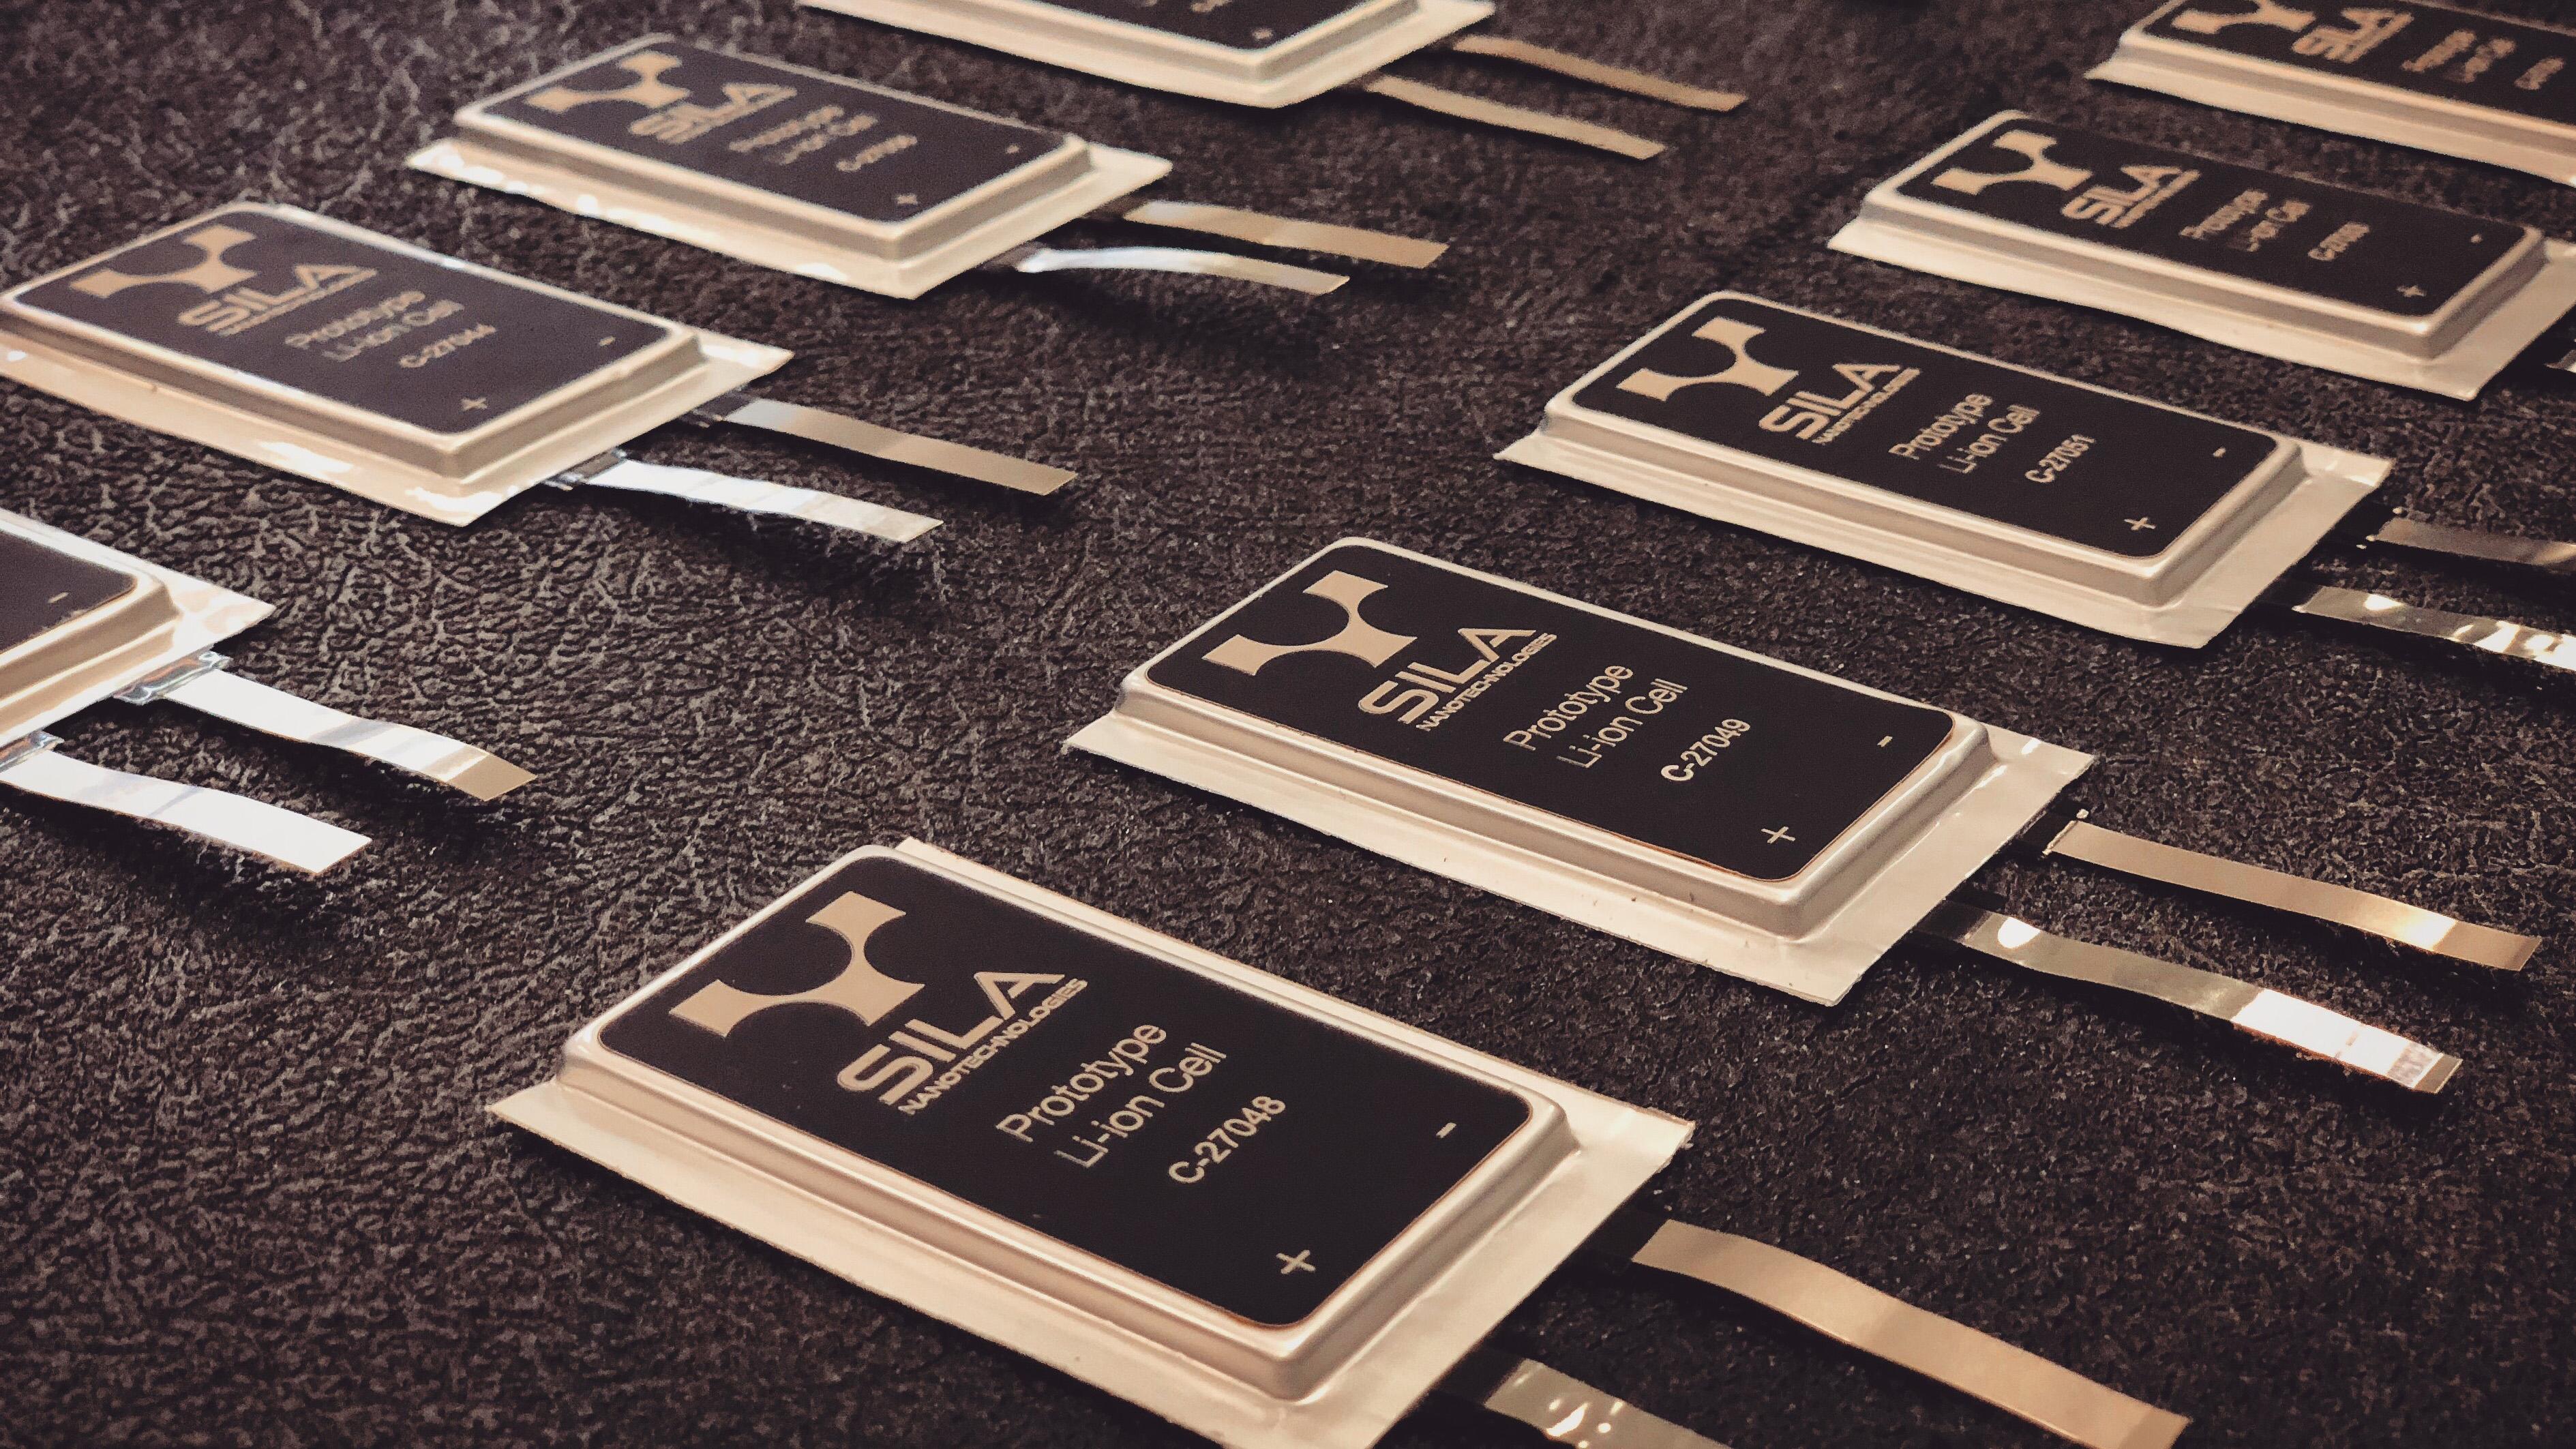 Sila Nanotechnologies has raised $70 million to build a